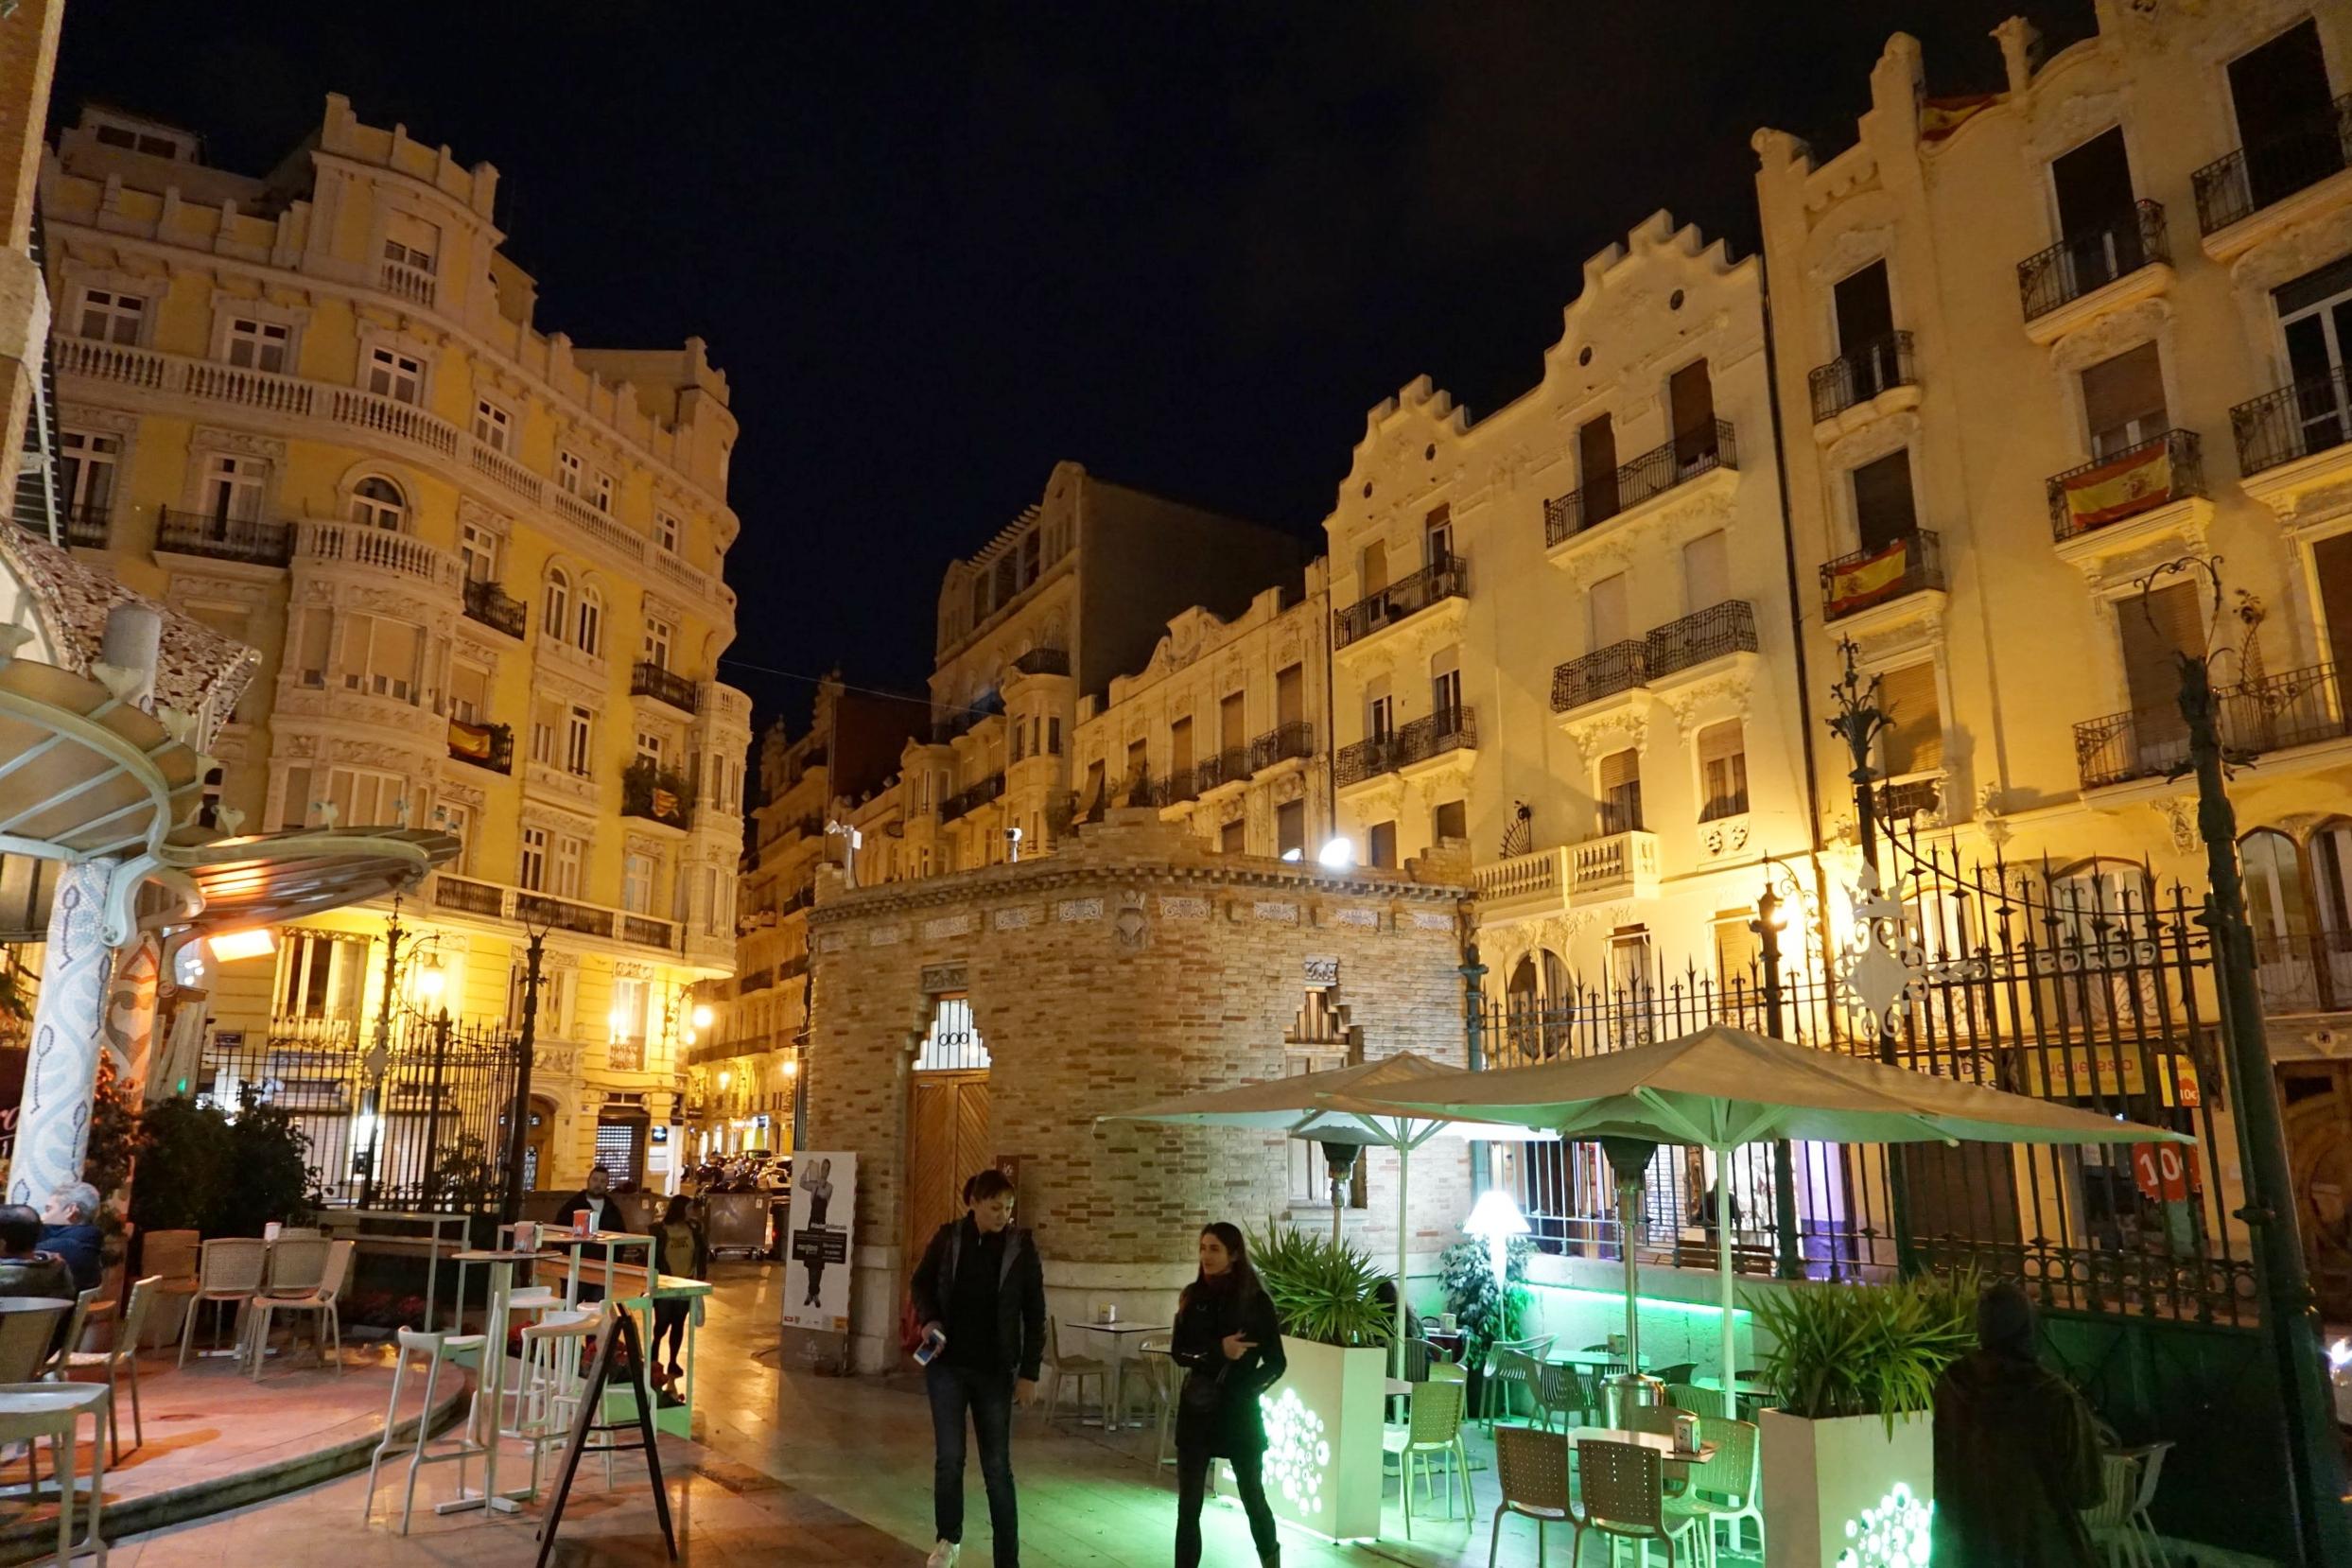 Outside patio of Mercado Colon in Valencia, Spain